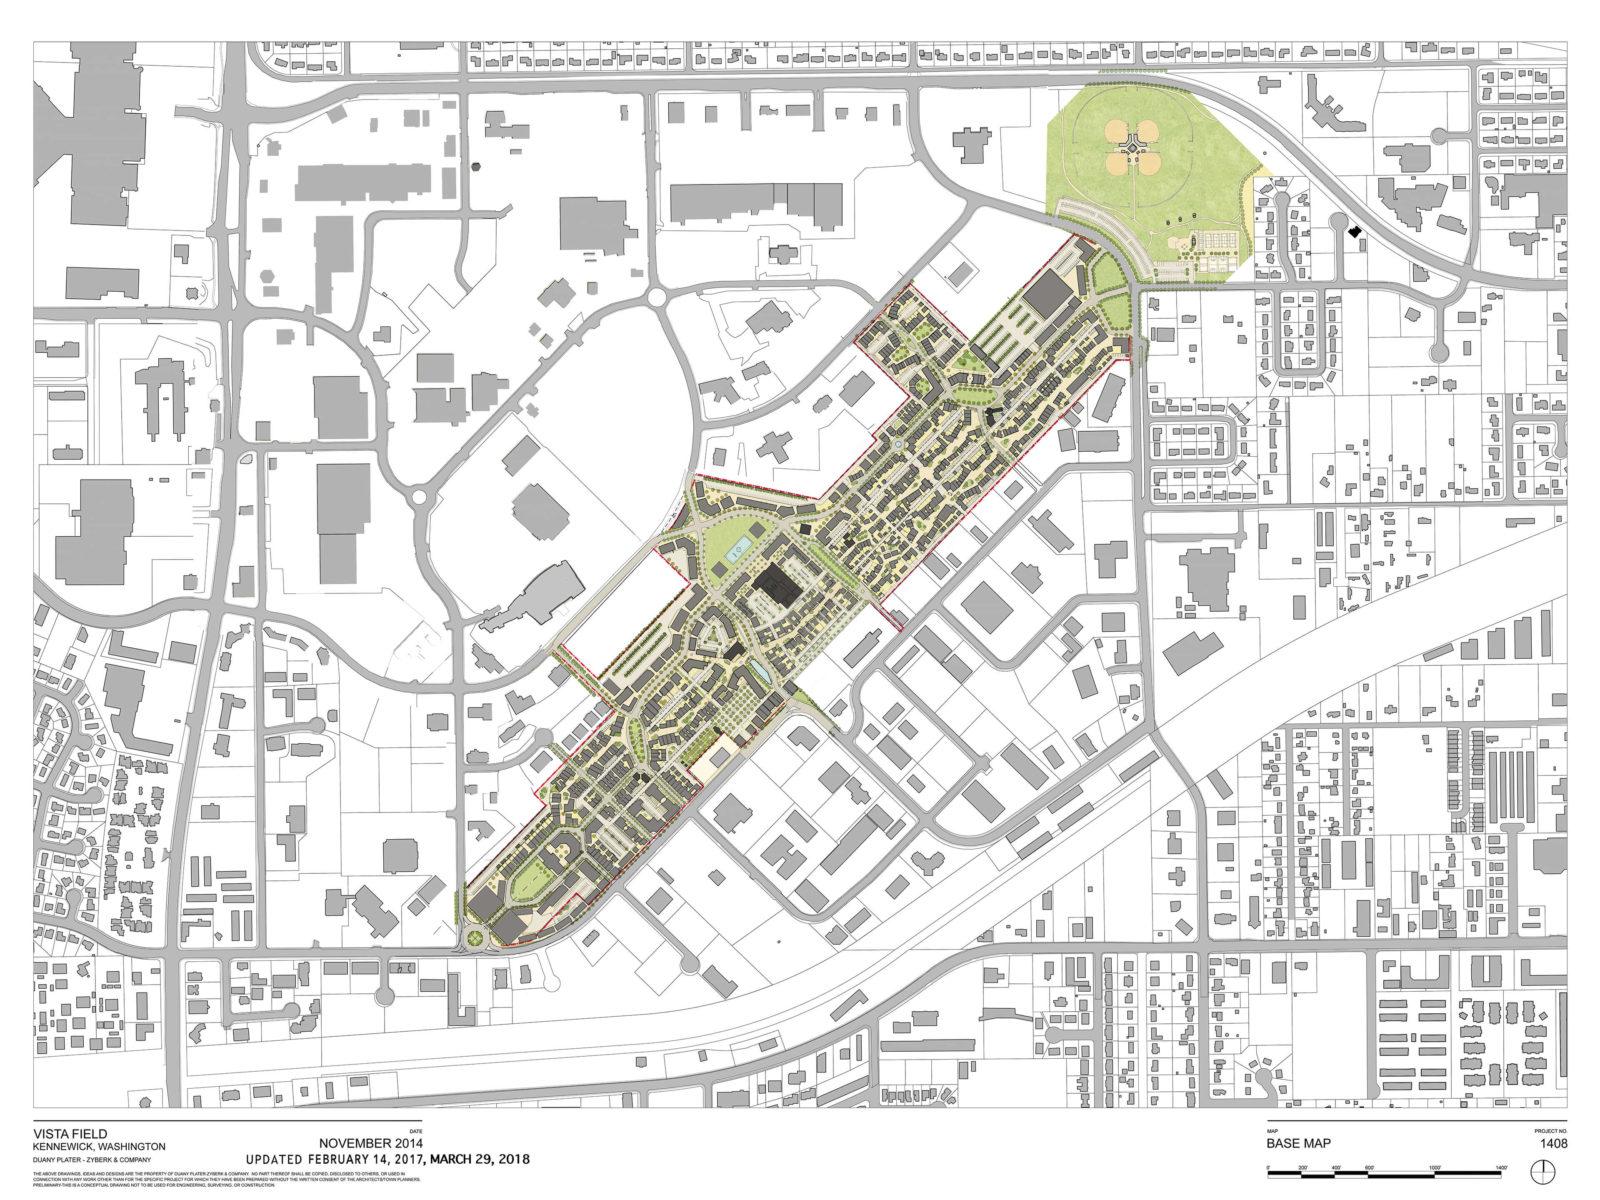 Vista Field full-site redevelopment plan.